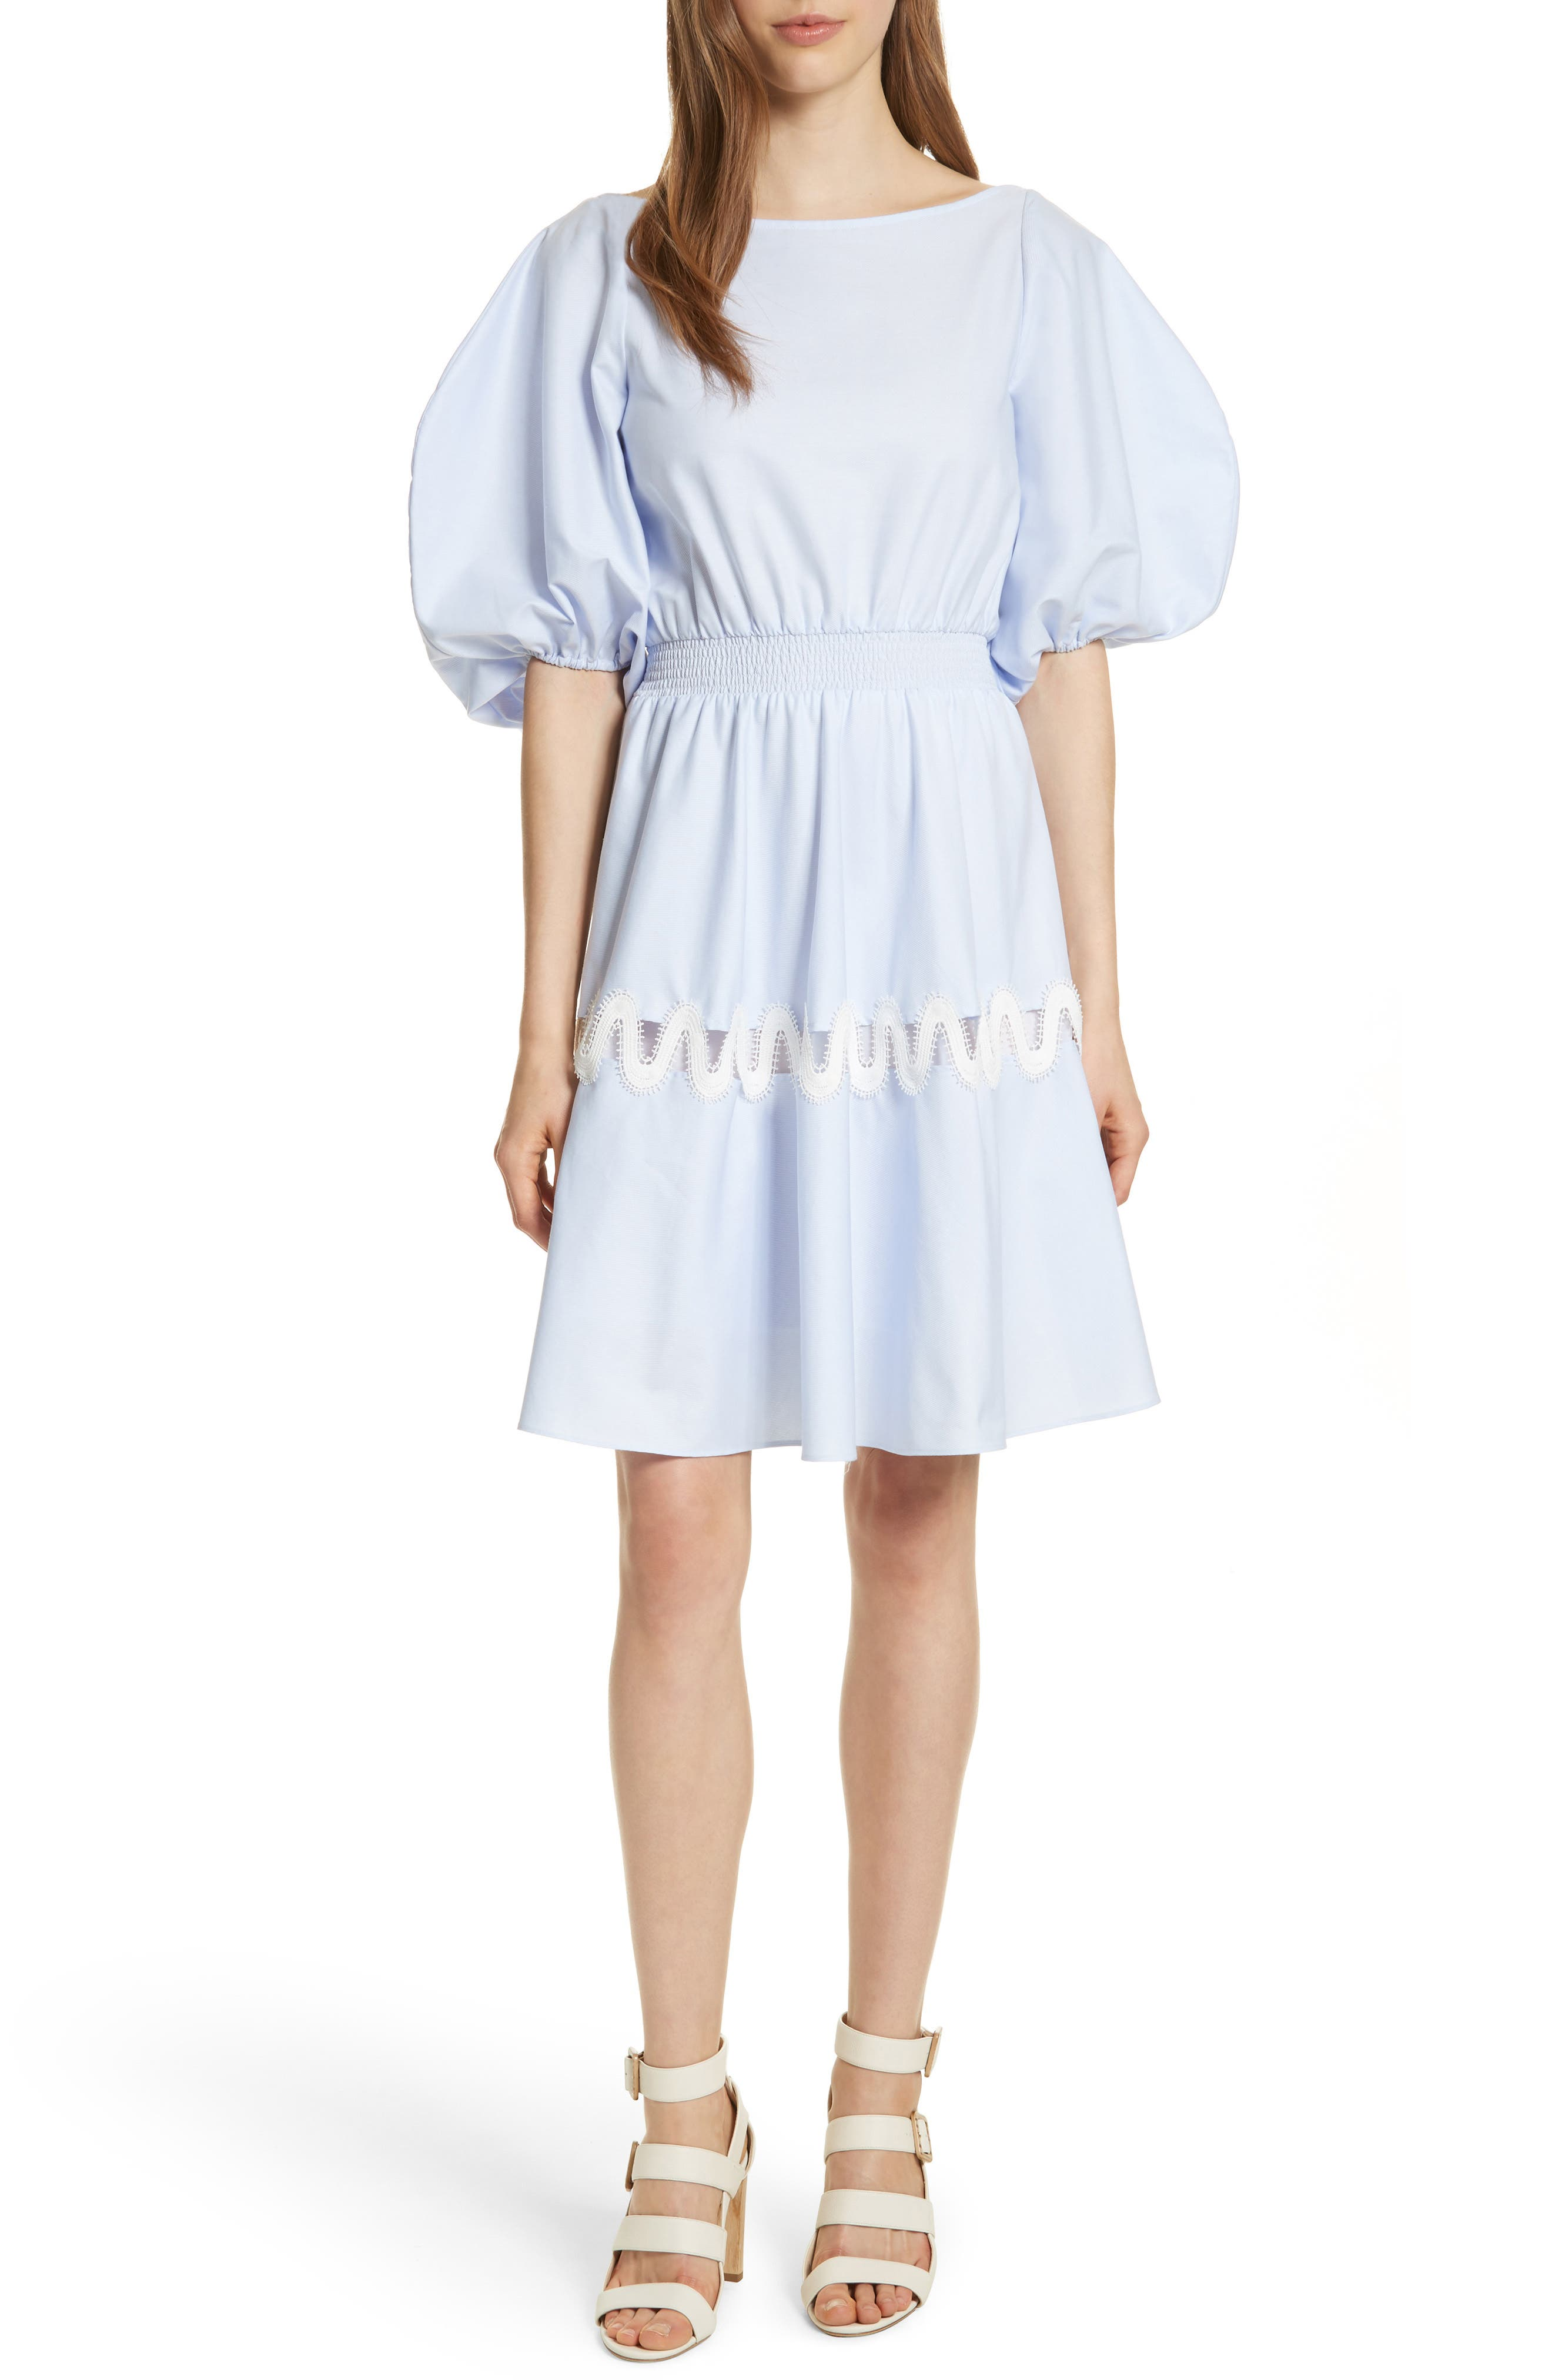 Main Image - Prose & Poetry Charleene Cotton Balloon Sleeve Dress